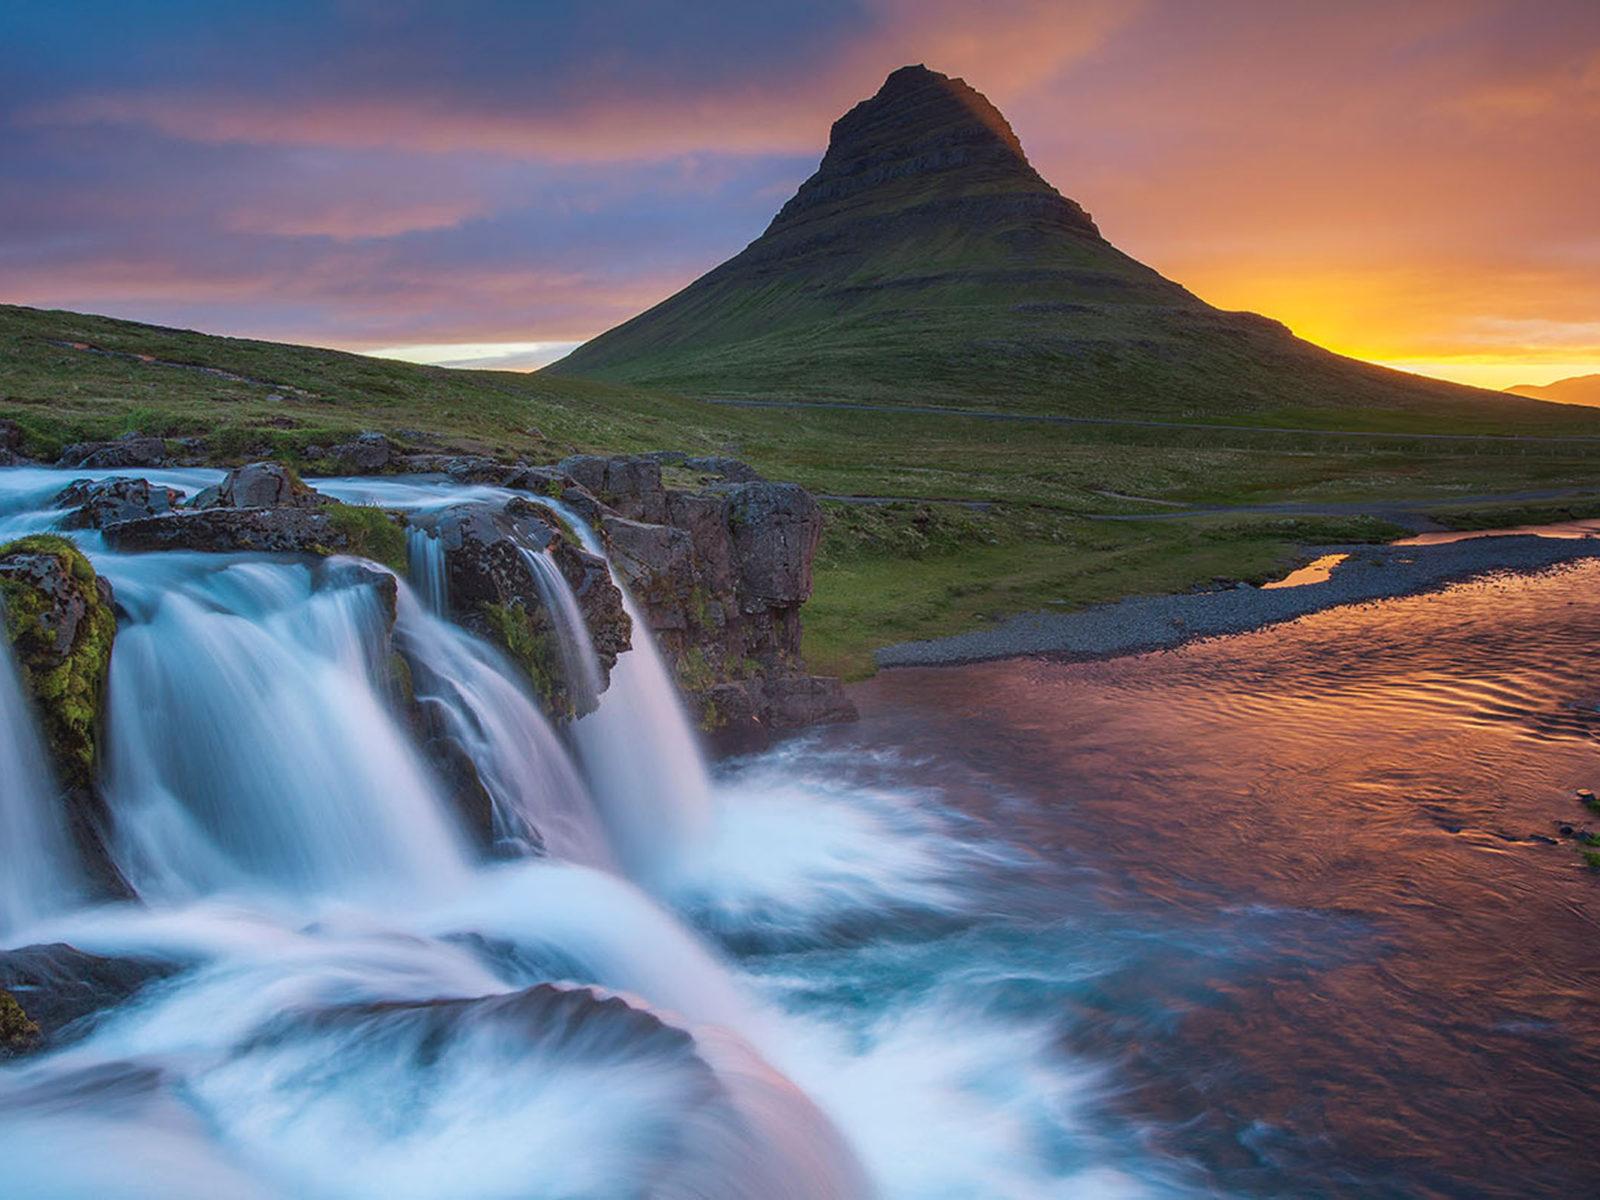 Iphone Wallpaper Waterfall Wallpaper Hd Kirkjufell Iceland Waterfall River Mountain